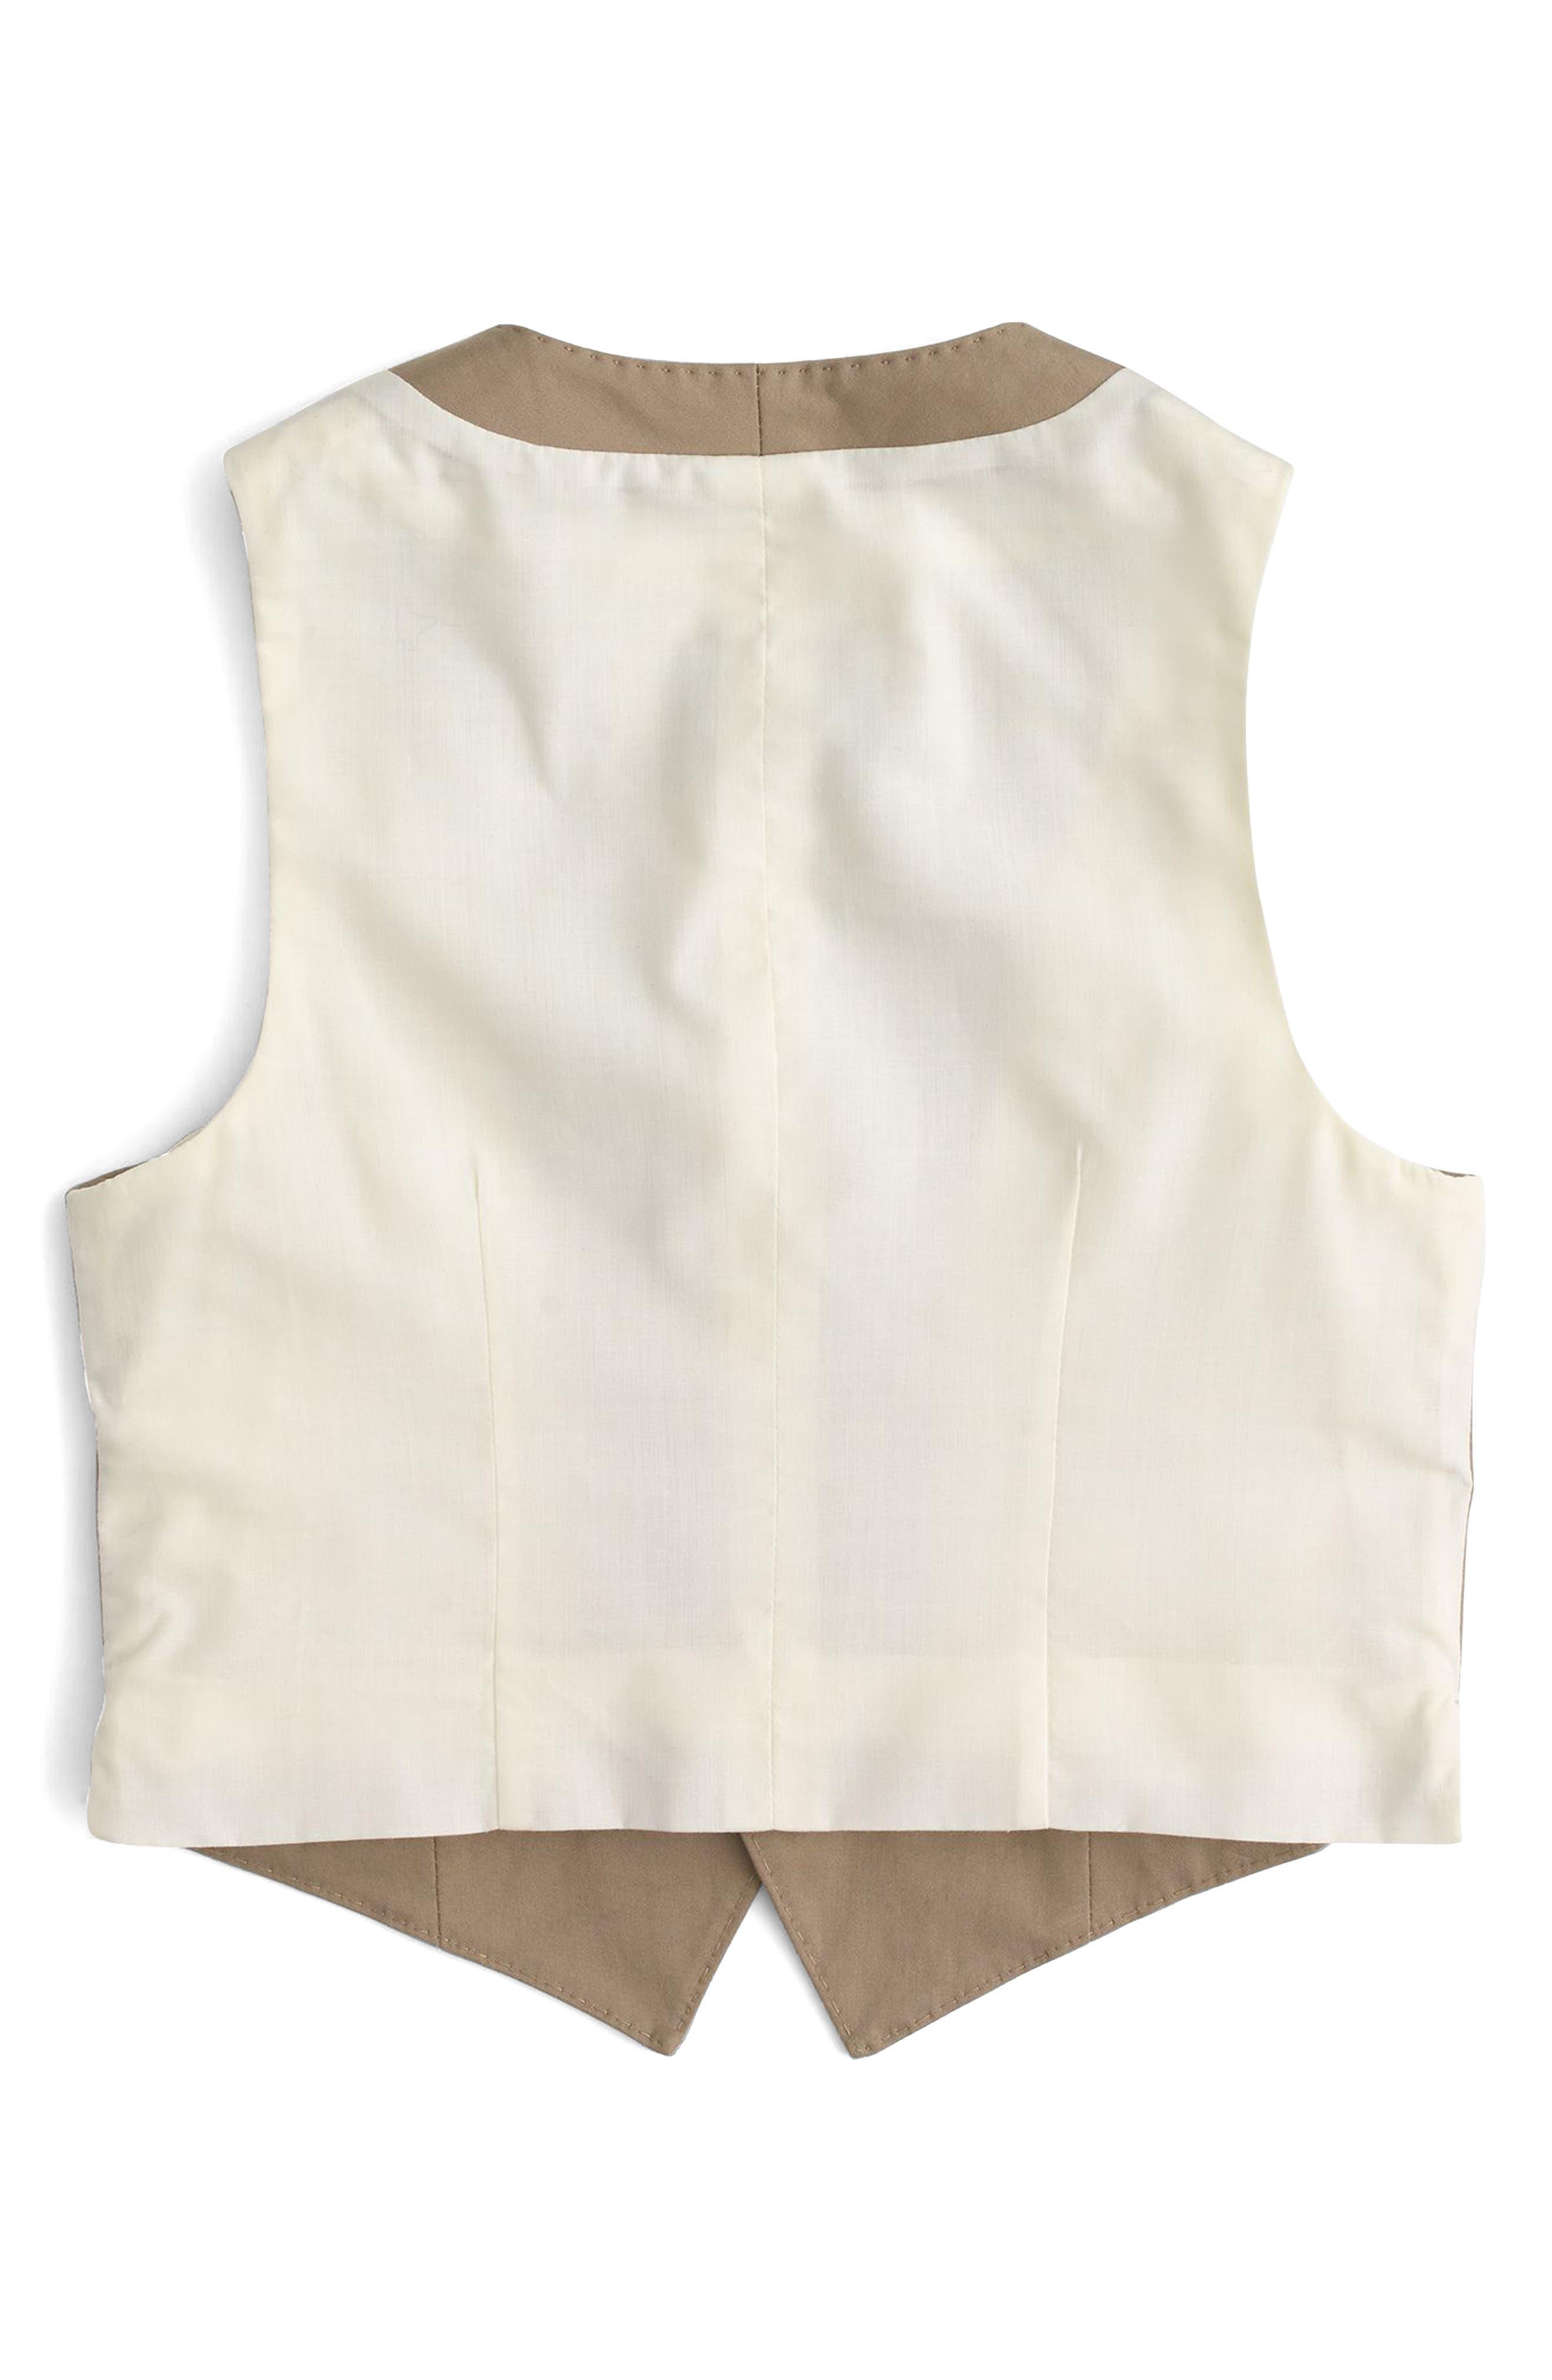 Alternate Image 2  - crewcuts by J.Crew Ludlow Suit Vest (Toddler Boys, Little Boys & Big Boys)